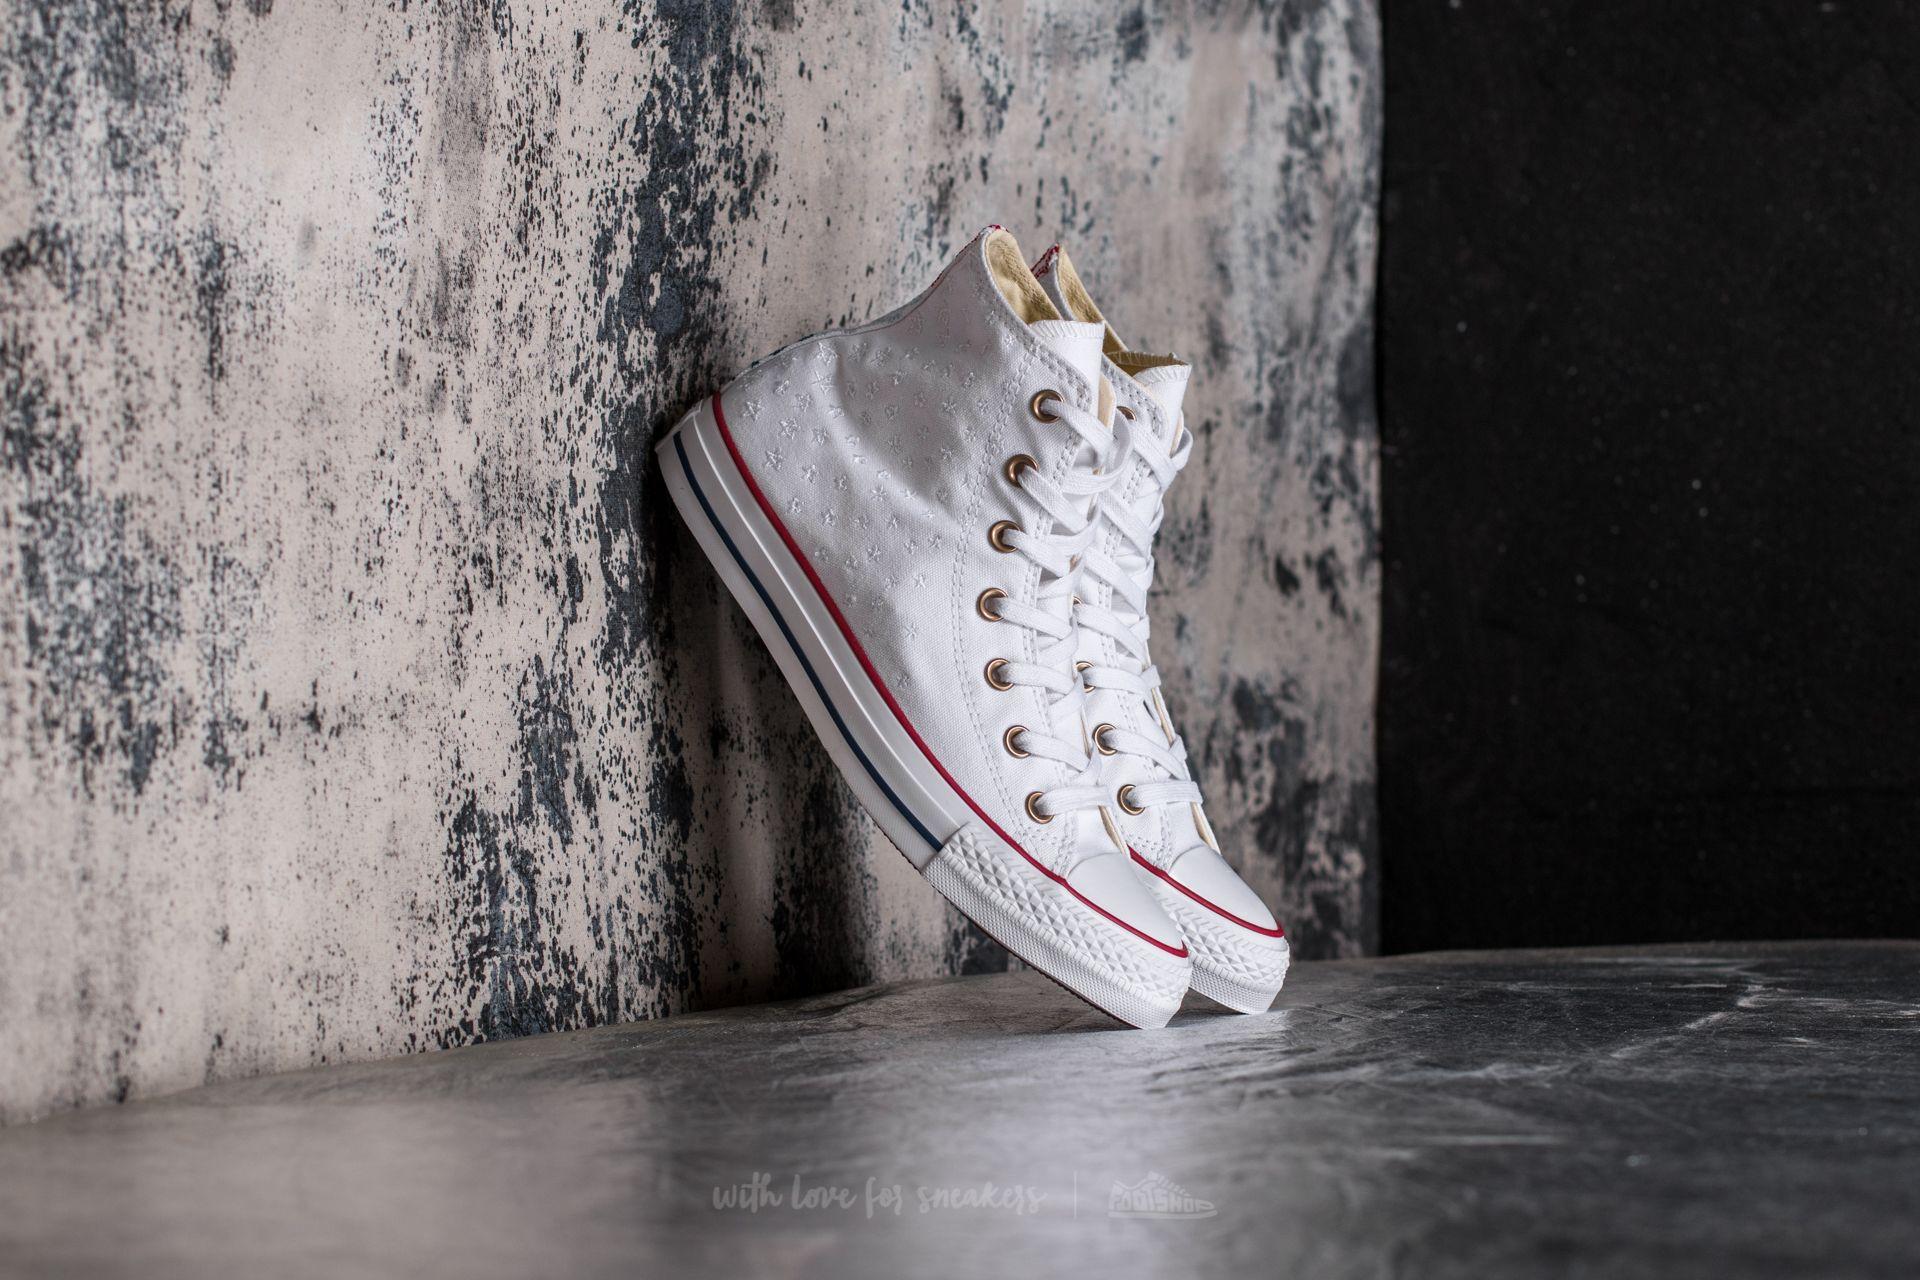 Converse Chuck Taylor All Star Hi White/ Casino Red/ Insignia Blue